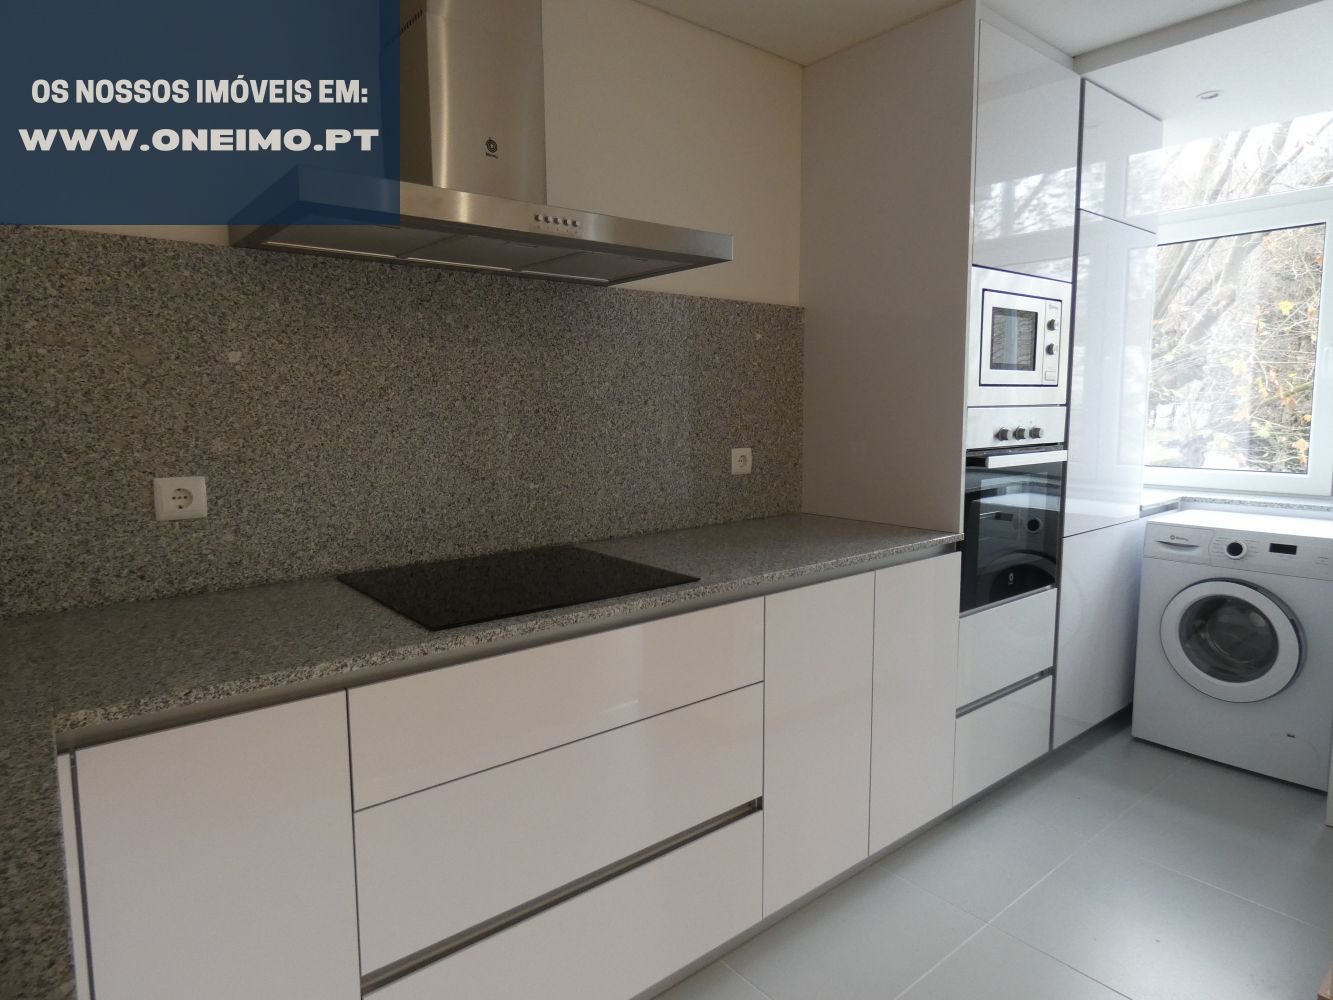 Venda Apartamento T1+1